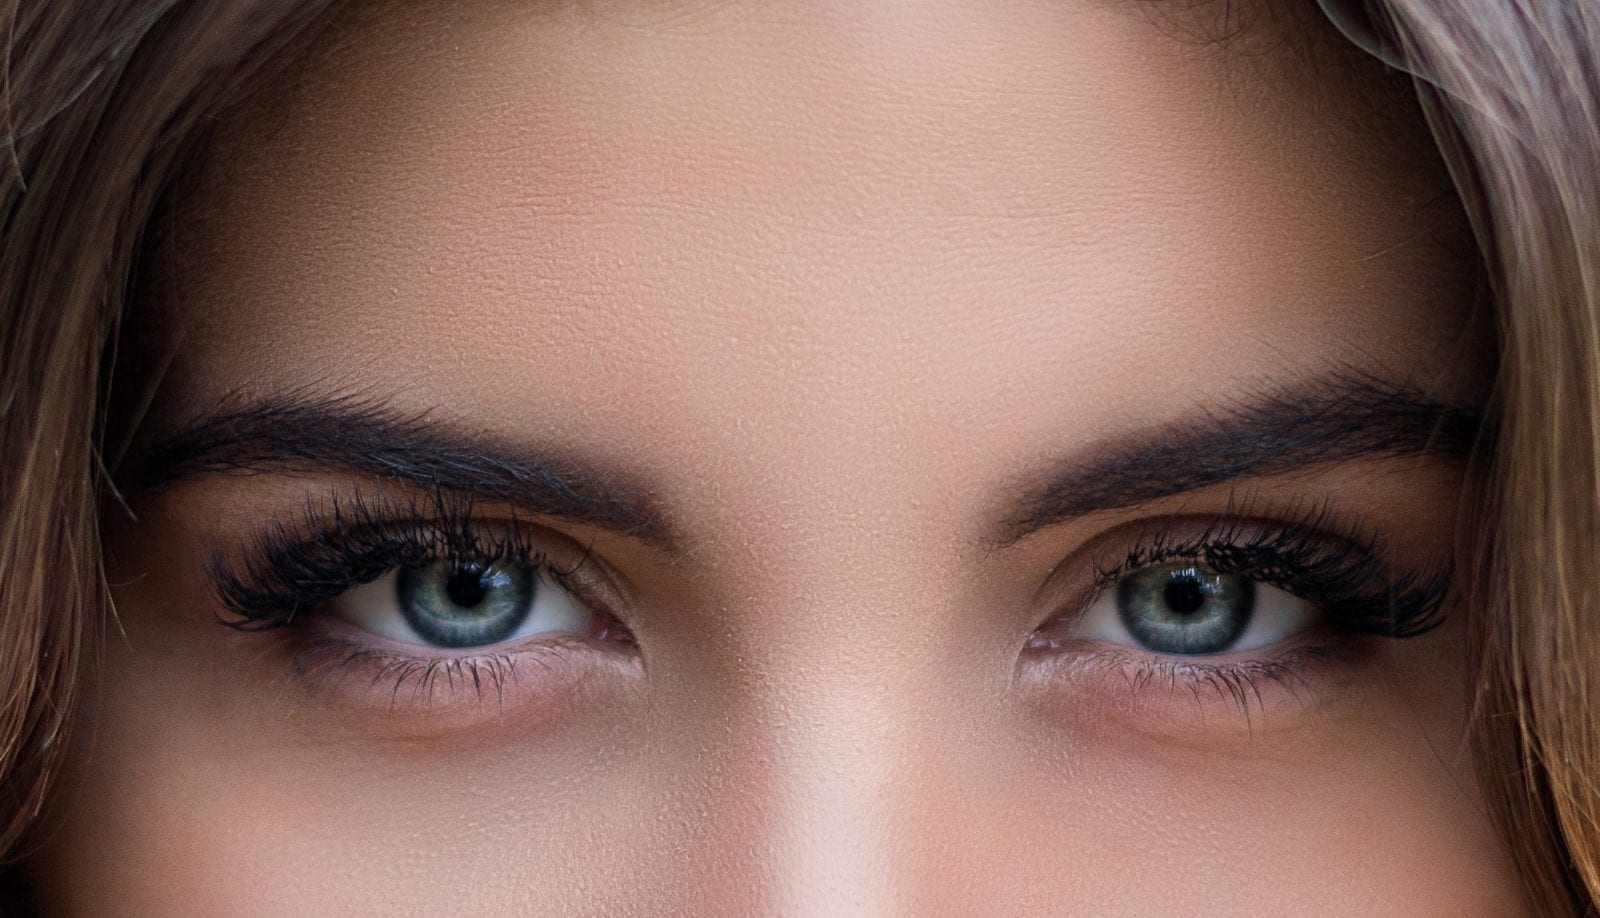 Saphir-Blading - Microblading - Kosmetik Artemania Fehraltorf - Nail Art - Beauty und Care